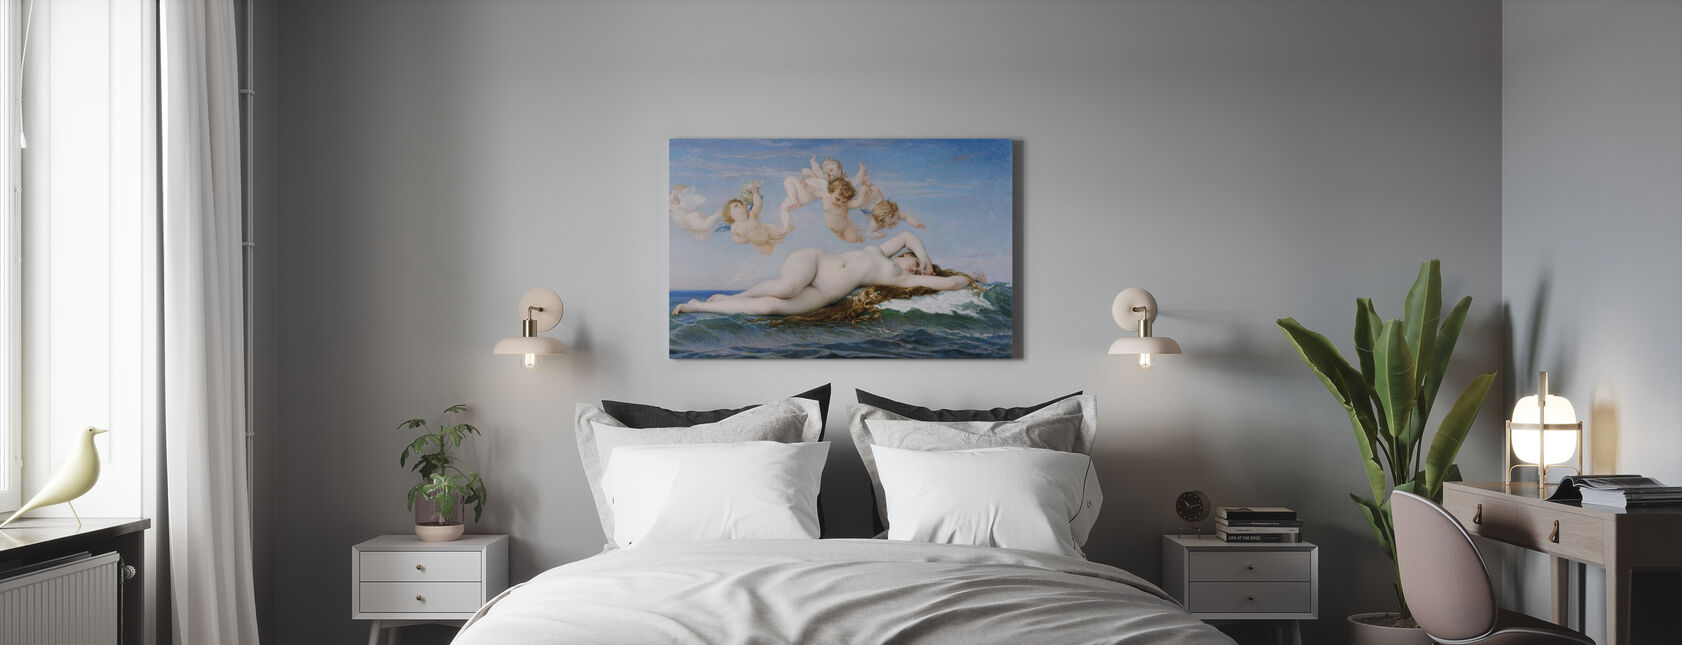 Birth of Venus, Alexandre Cabanel - Canvas print - Bedroom